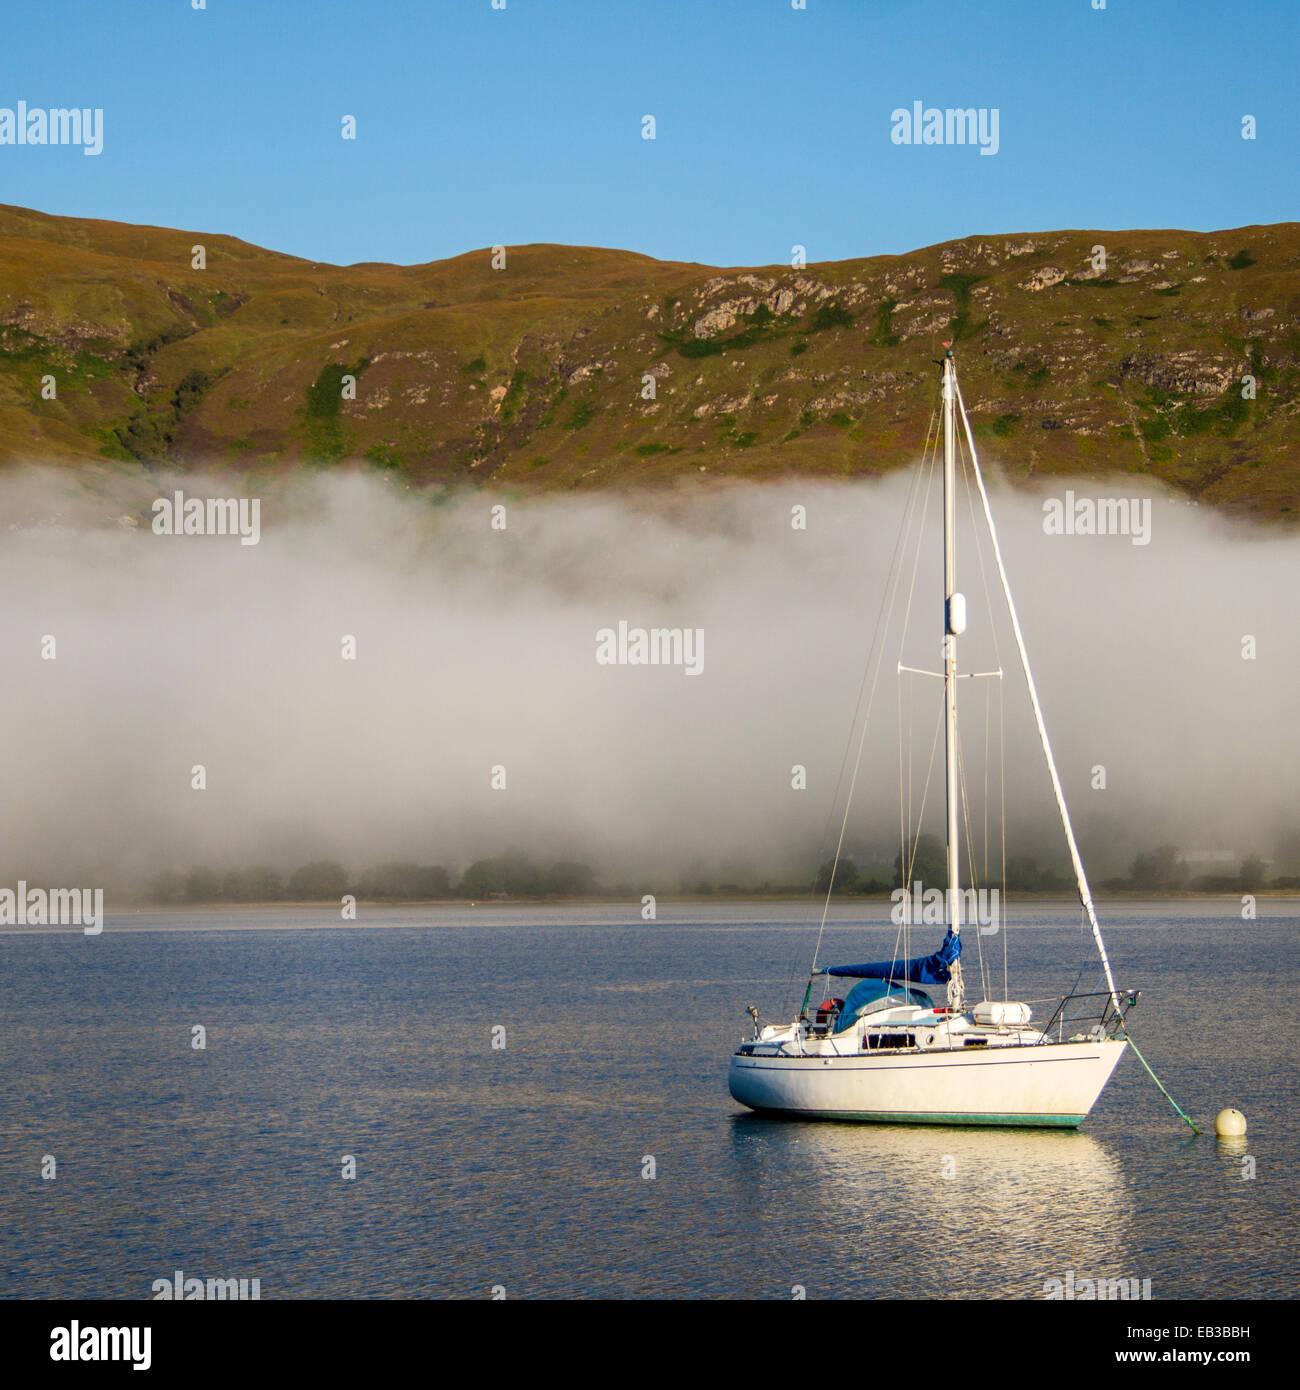 UK, Scotland, Sailboat on loch with fog - Stock Image